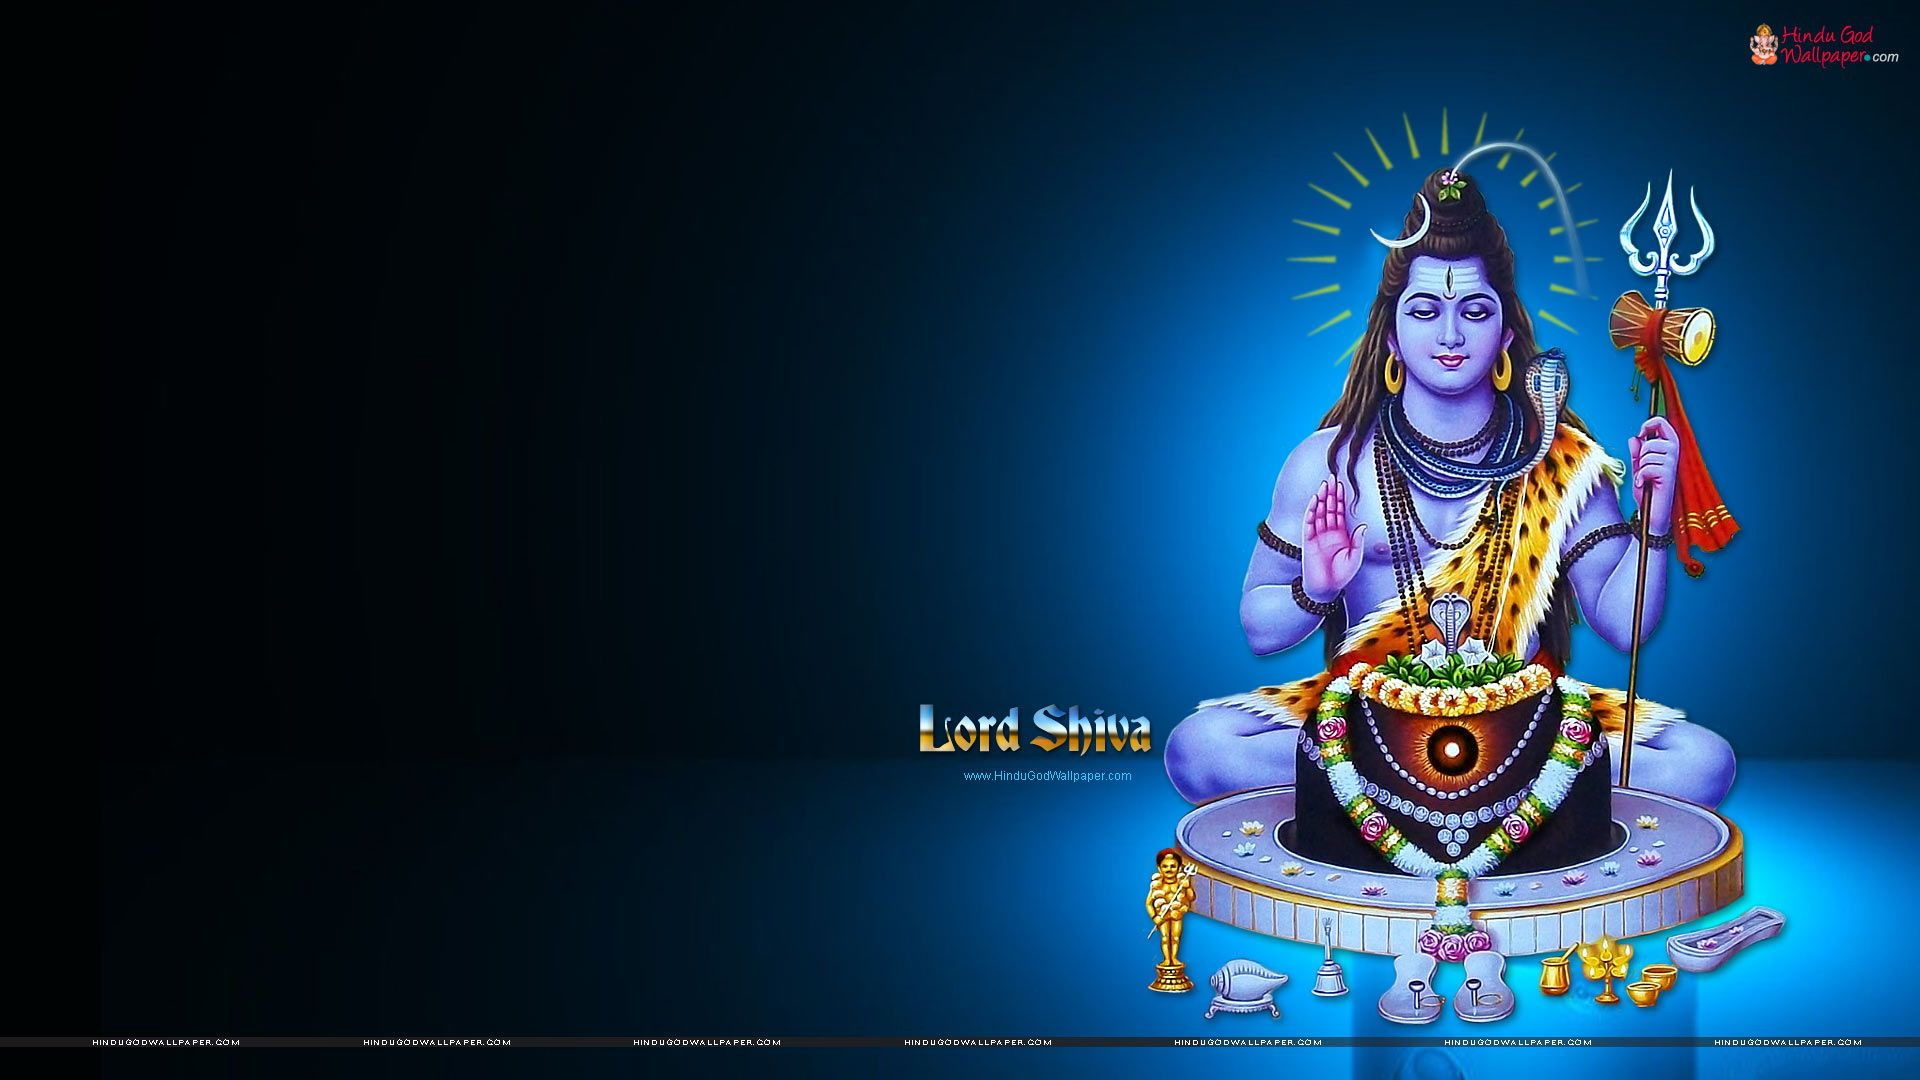 Lord shiva hd wallpapers free wallpaper downloads lord shiva hd lord shiva hd wallpapers free wallpaper downloads lord shiva hd voltagebd Images